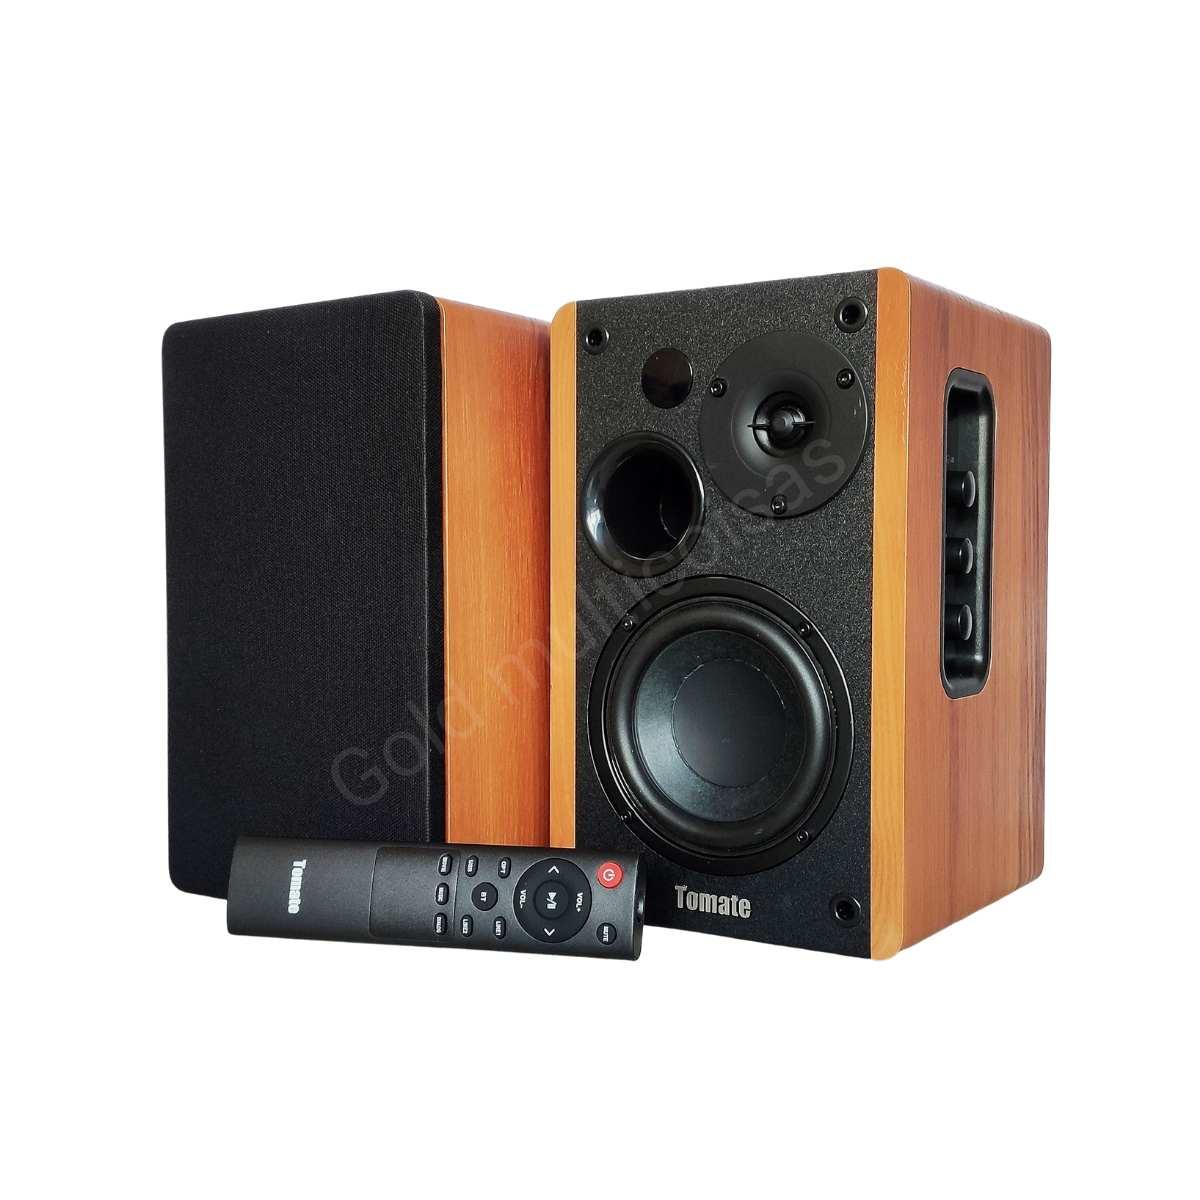 Caixa De Som Ativa Monitor Bluetooth Óptico Tomate Mts 2026 Preto